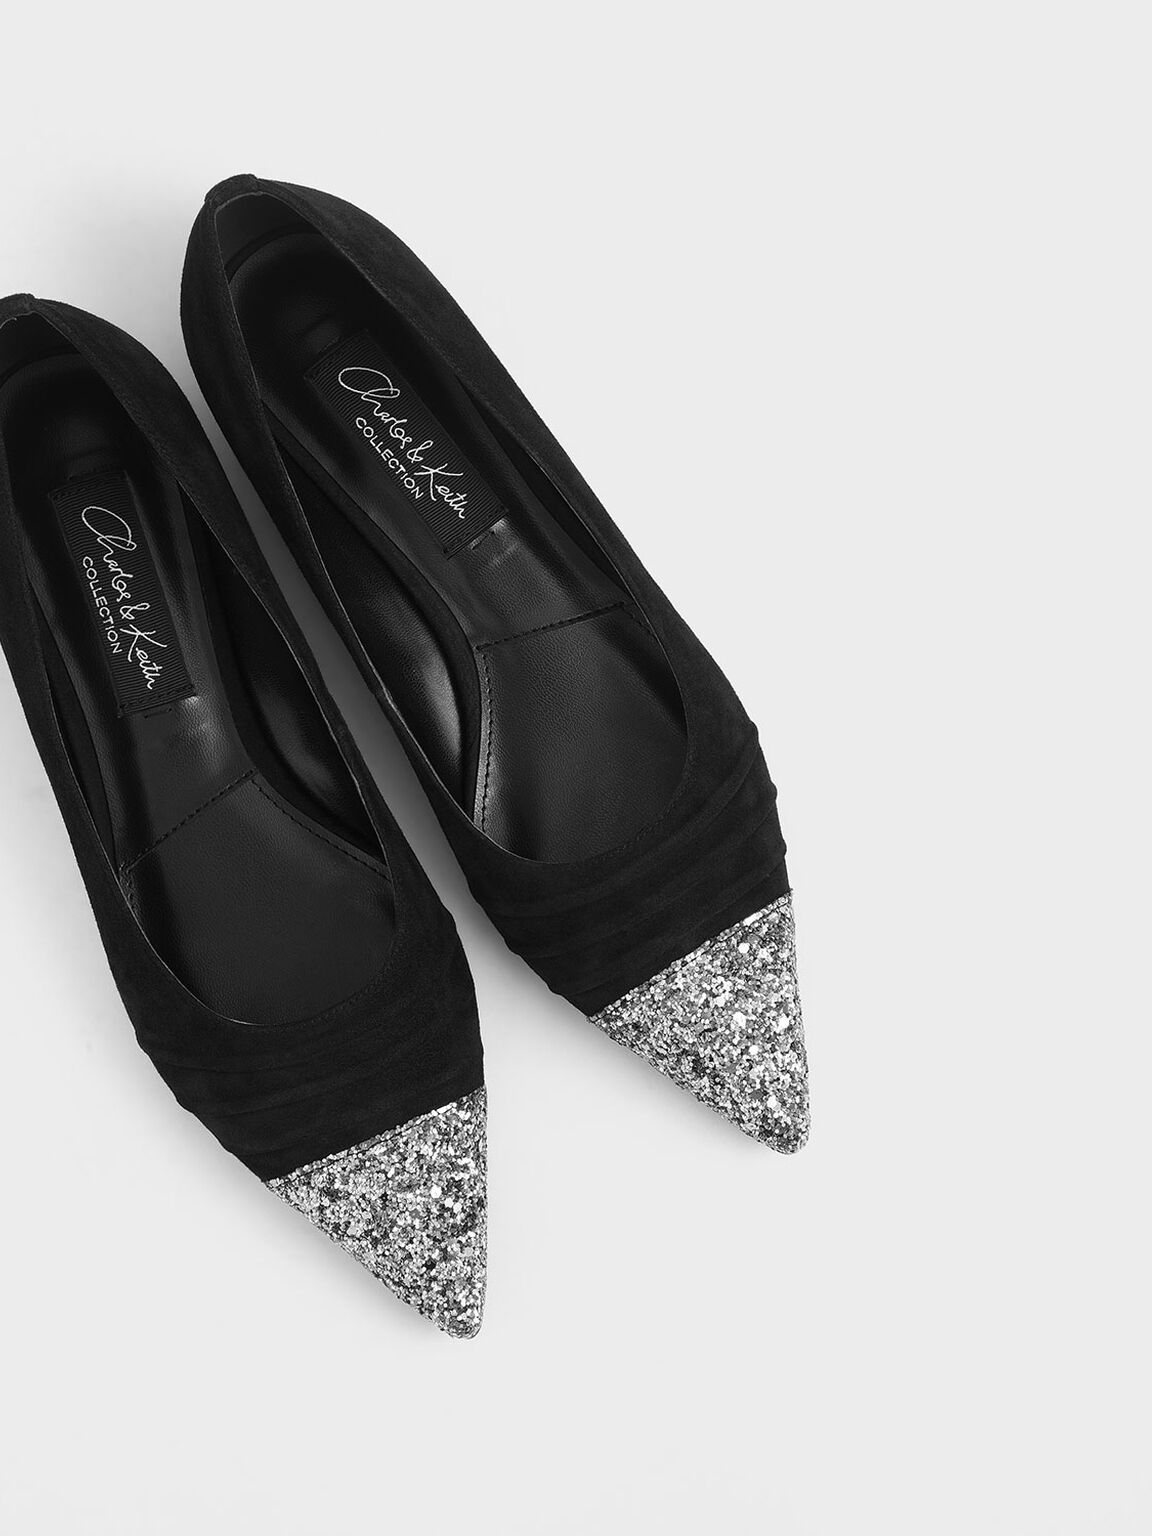 Kid Suede Glitter Ballerina Flats, Black, hi-res